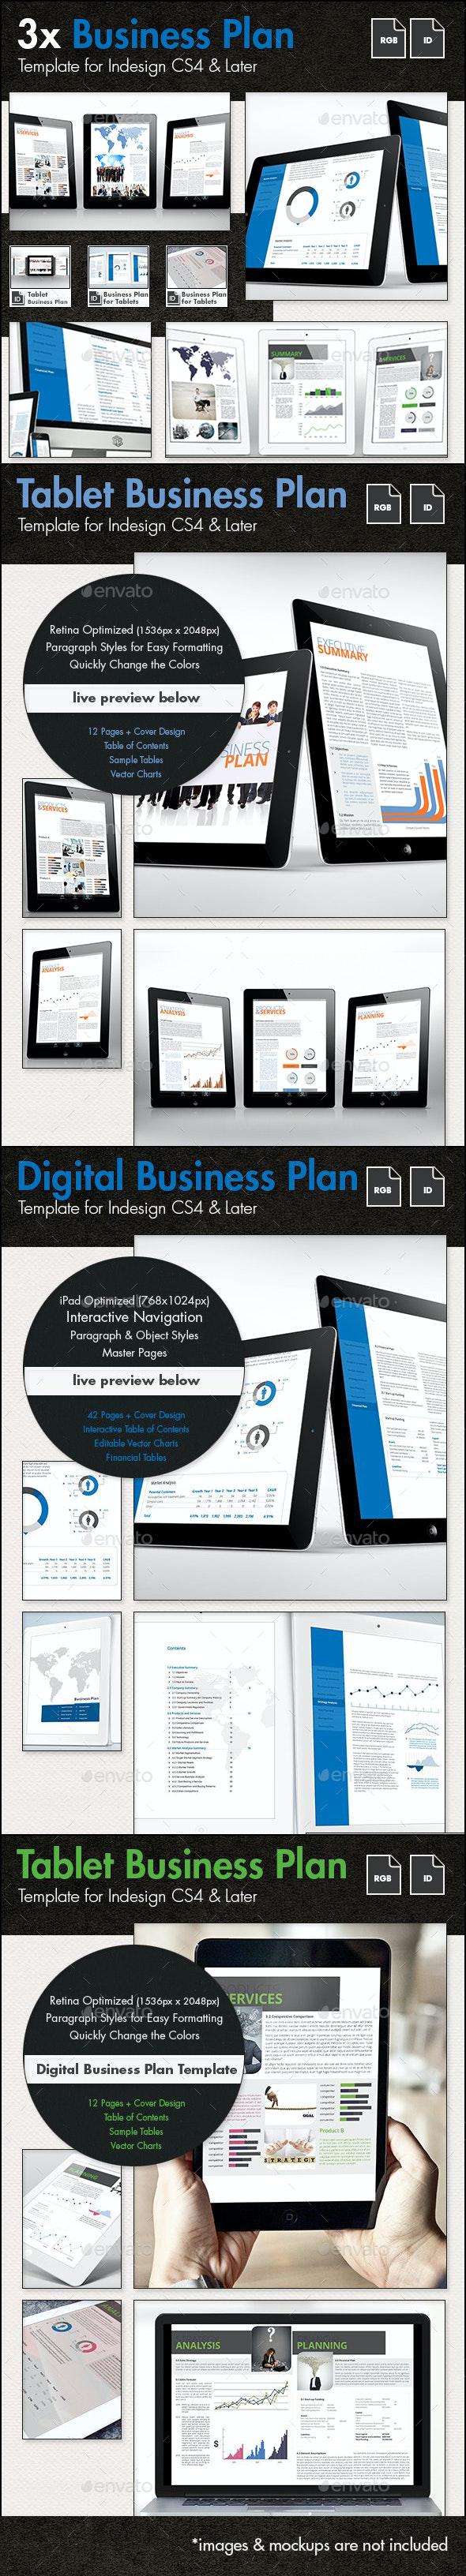 Business Plan for Tablets - The Bundle - Digital Books ePublishing